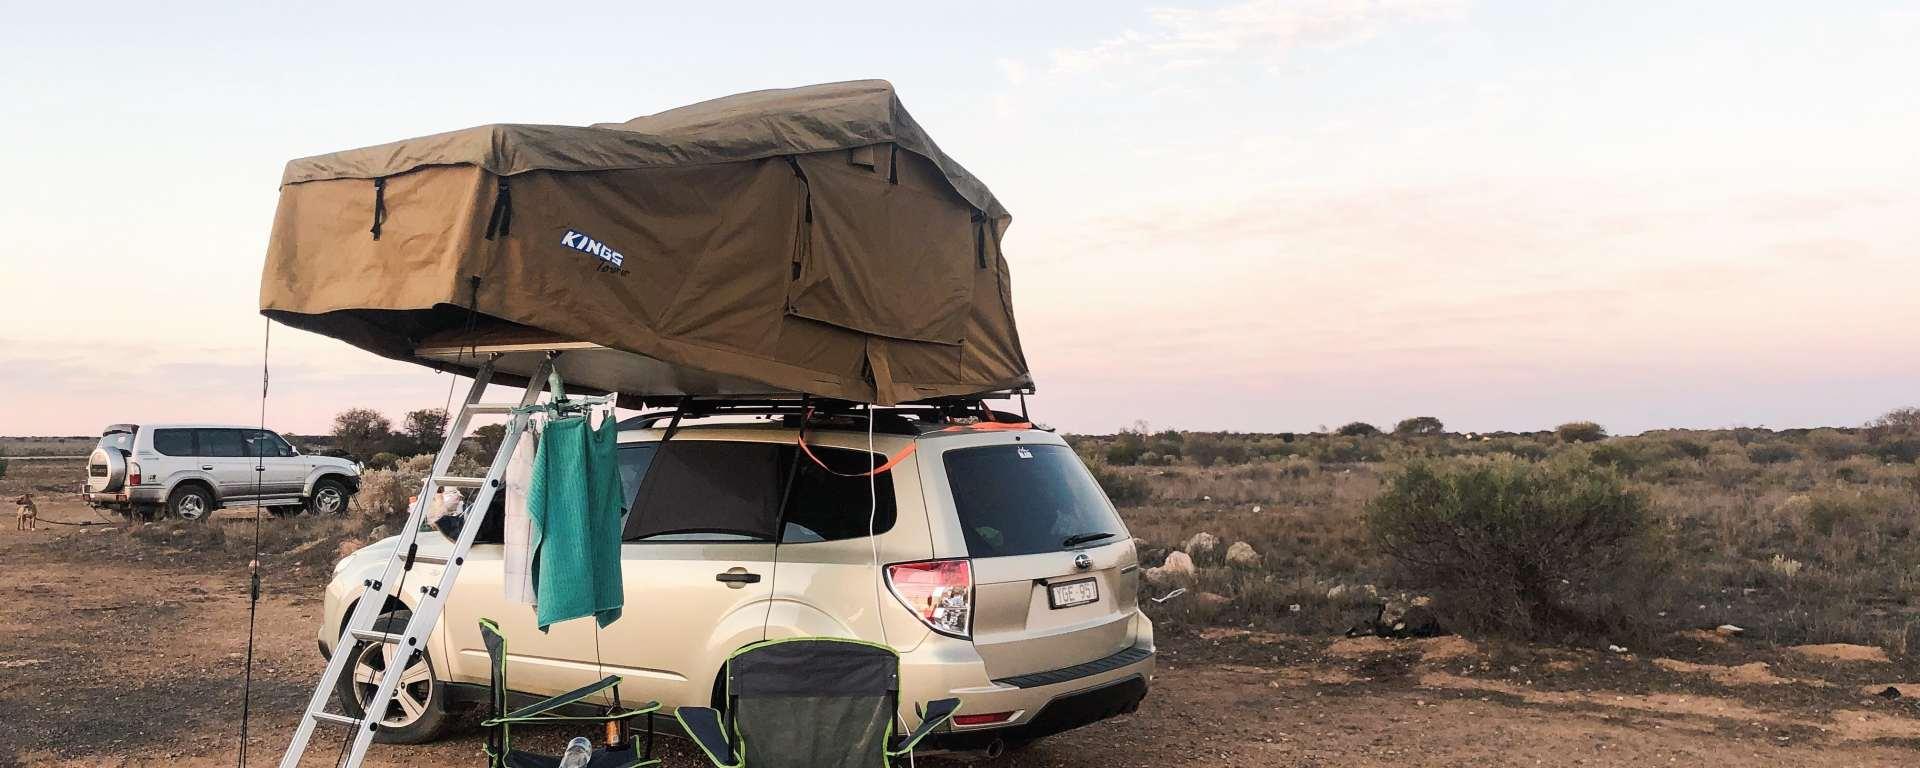 Adventure Kings Roof Top Tent types of campers in australia